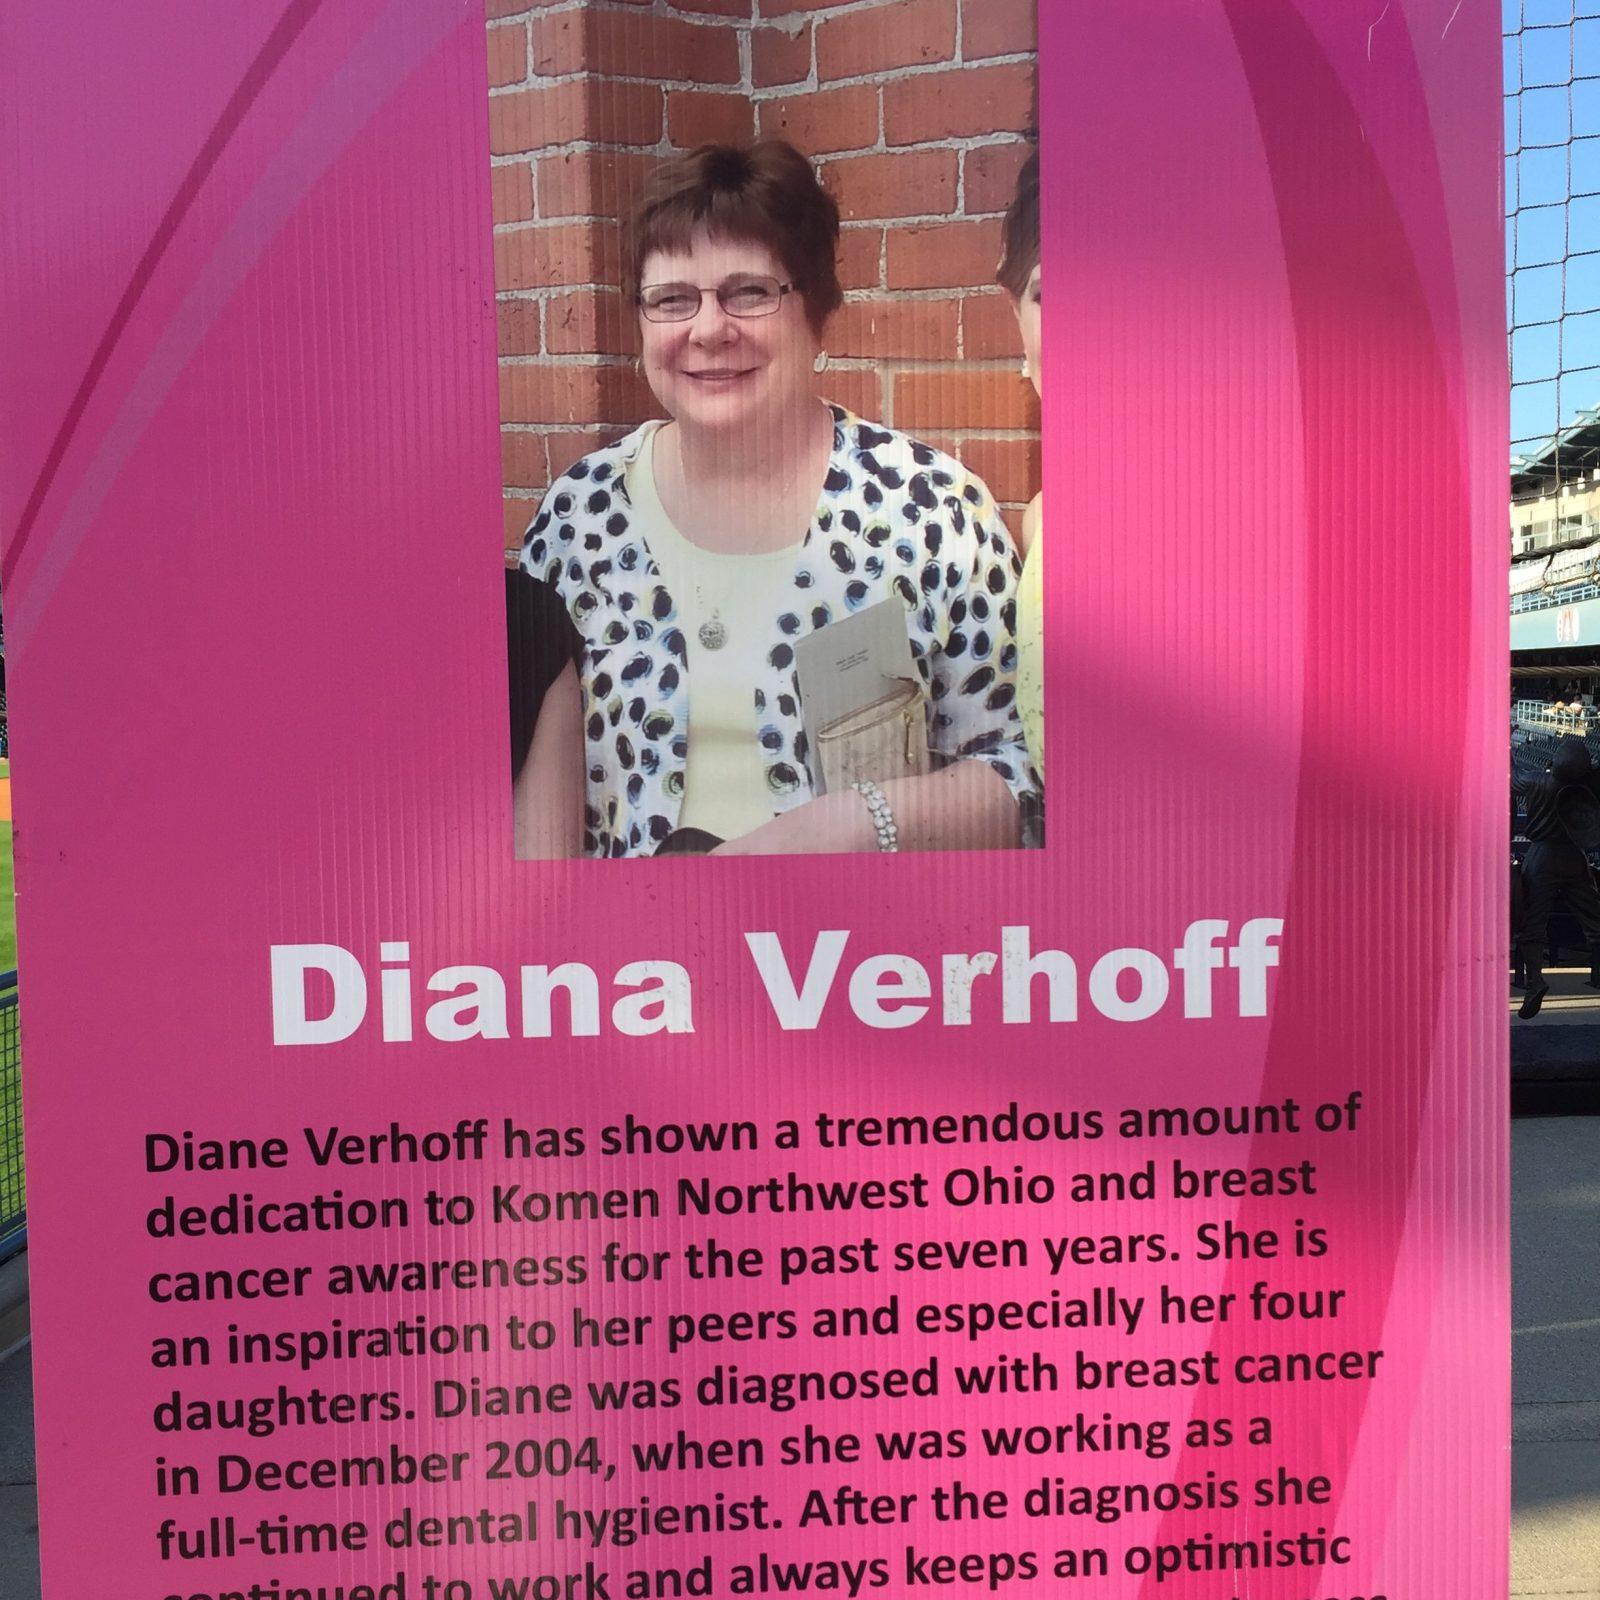 Diana Verhoff